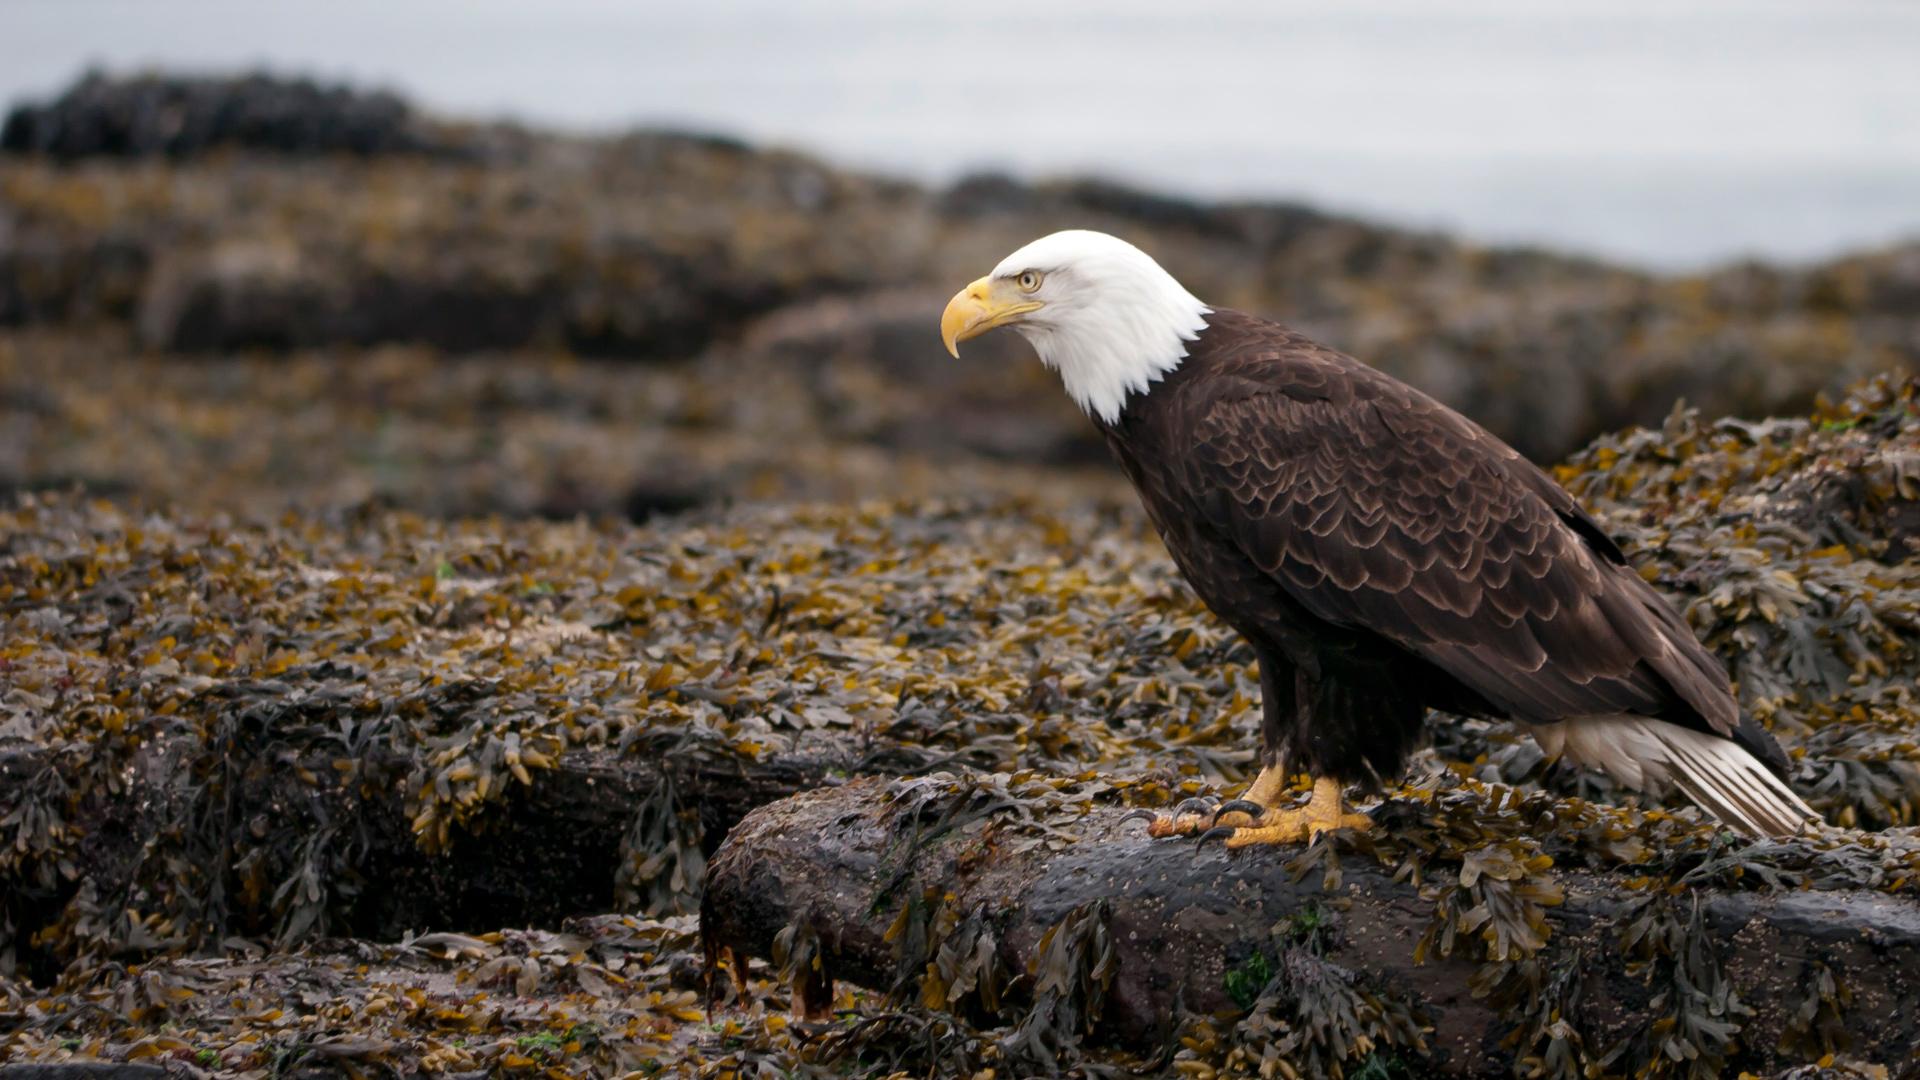 bald-eagle-portland-island-02-1920w.jpg